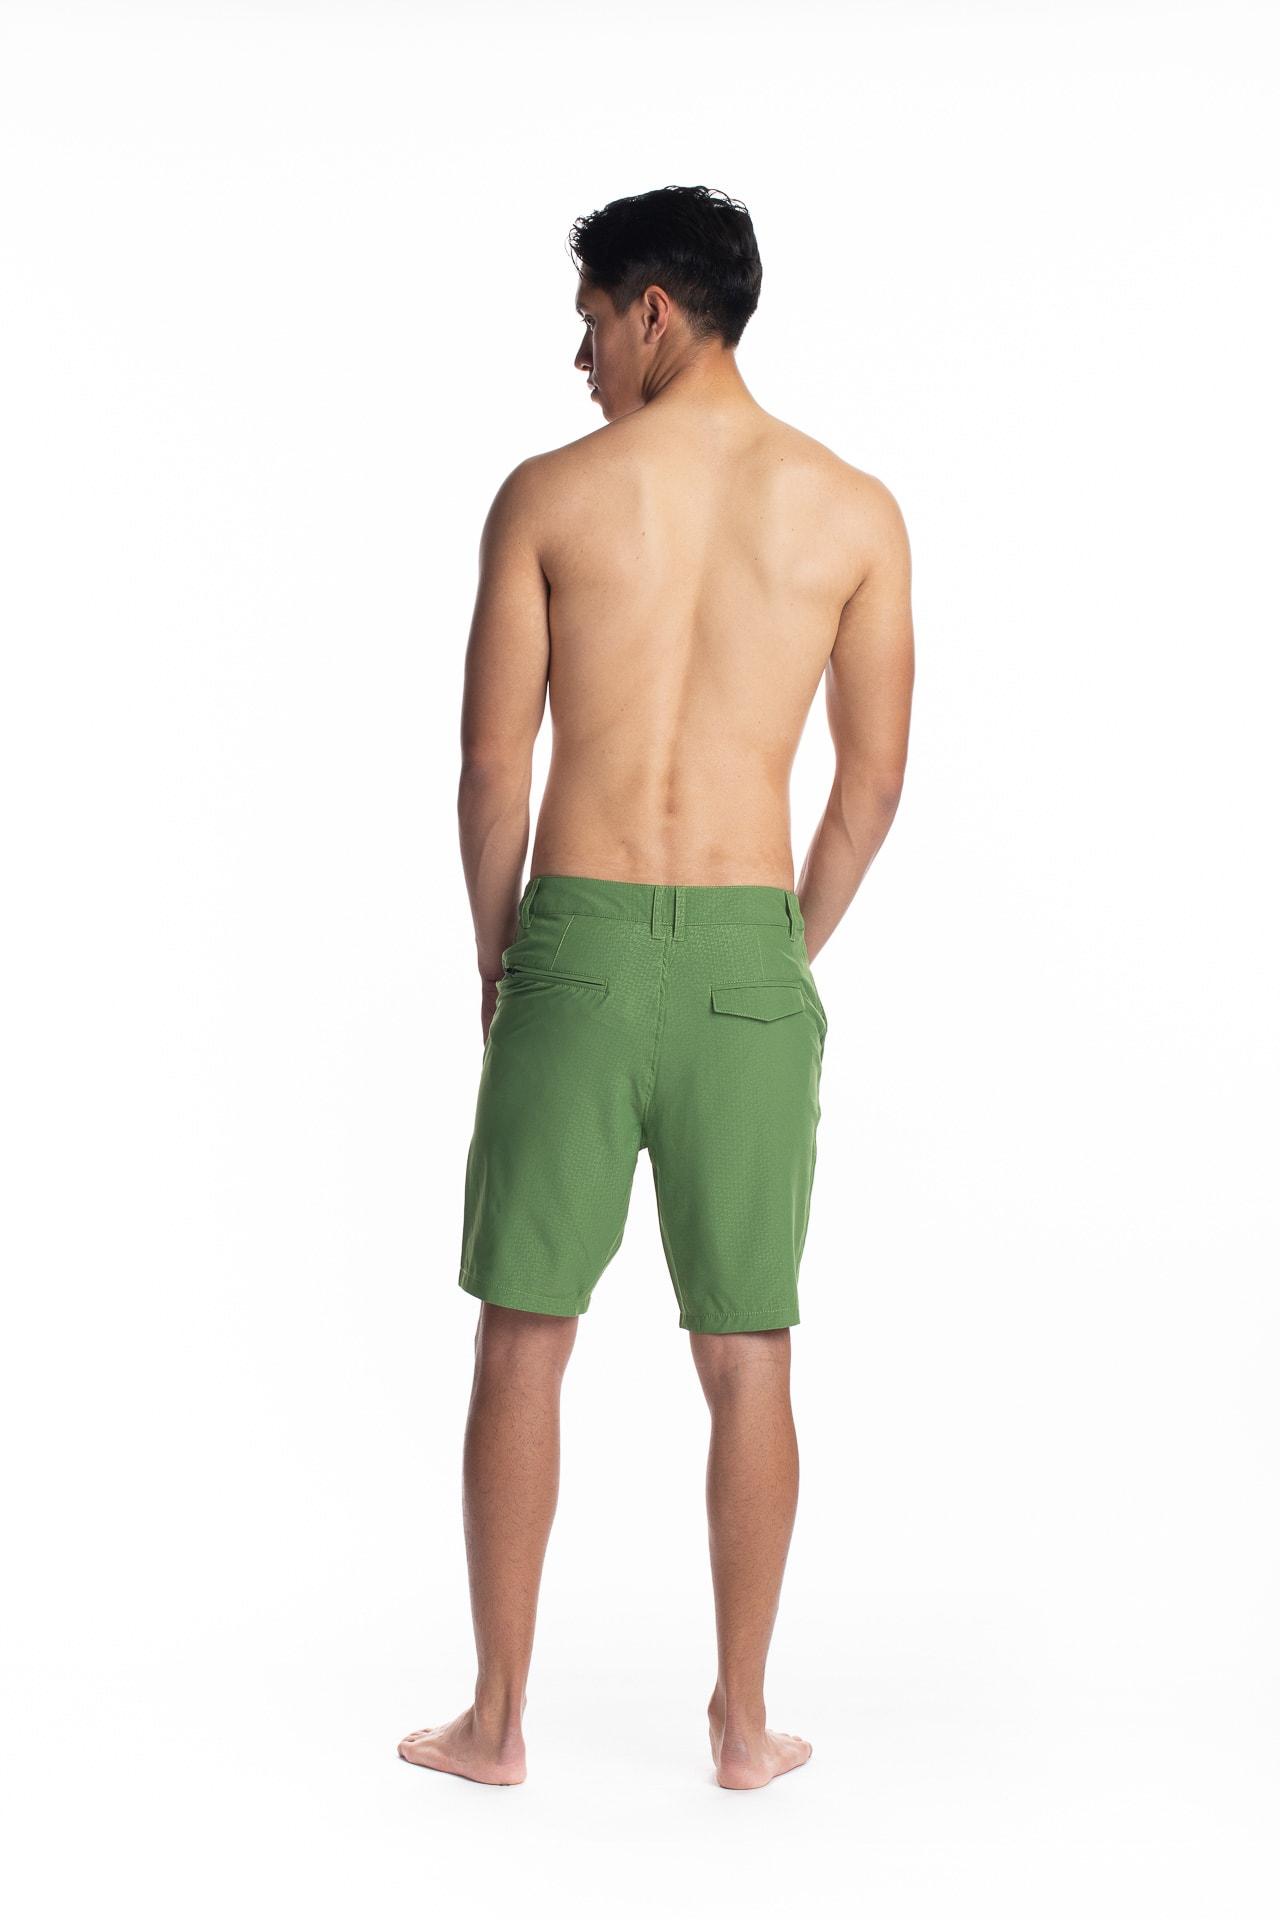 Male model wearing 4-way Stretch in Green Niau - Back View